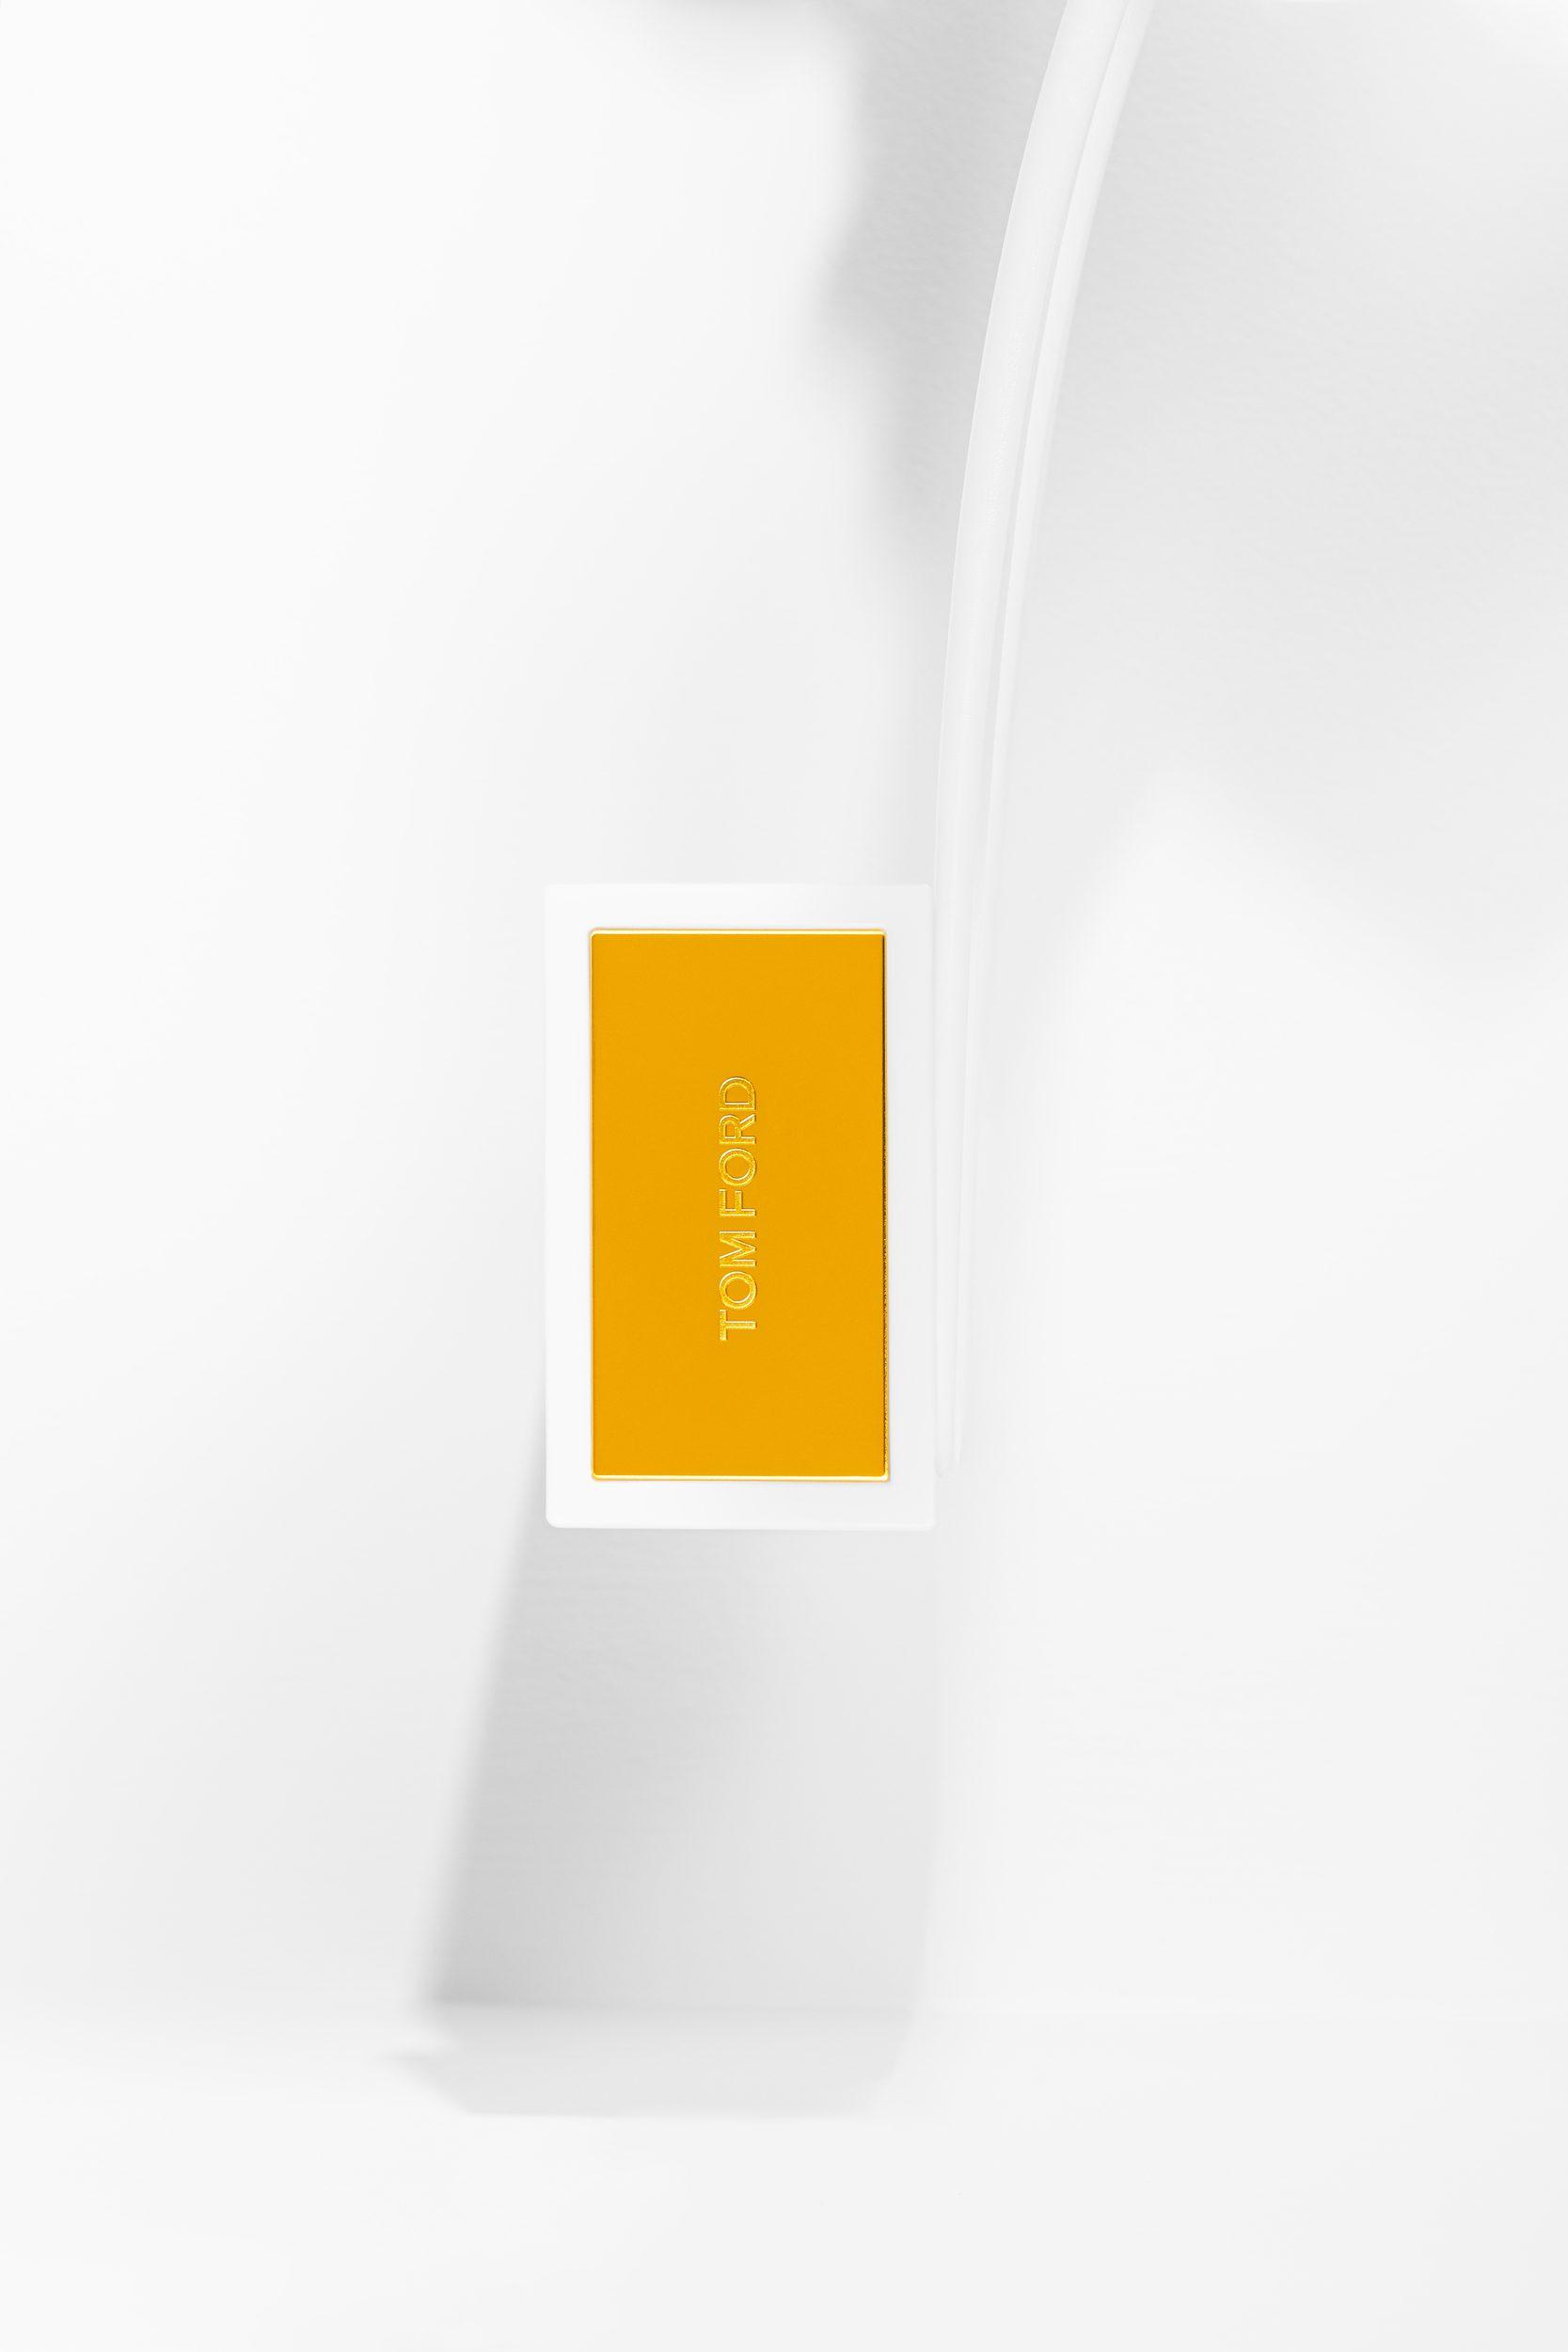 Tom_Ford_Soleil_Blanc-Eau-De-Parfum-SH_01-02©Aivaras_Simonis